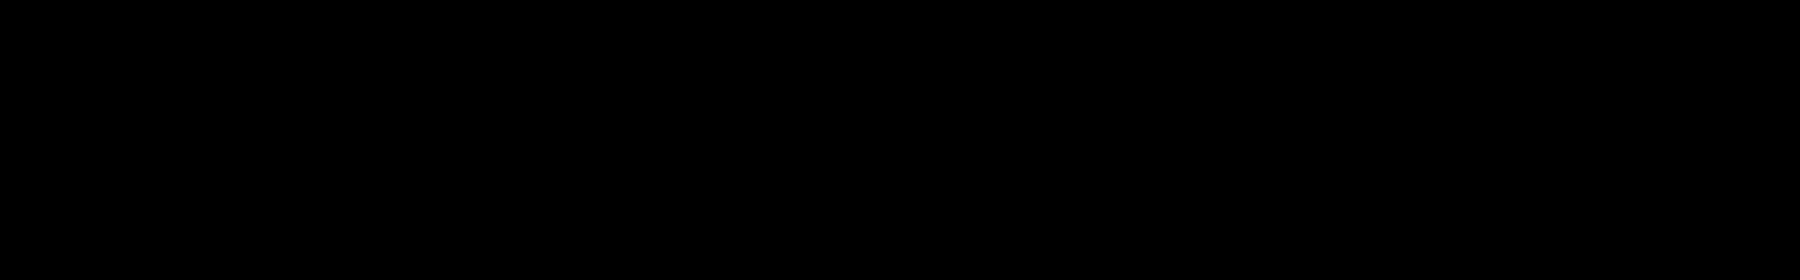 DARK PSYTRANCE audio waveform